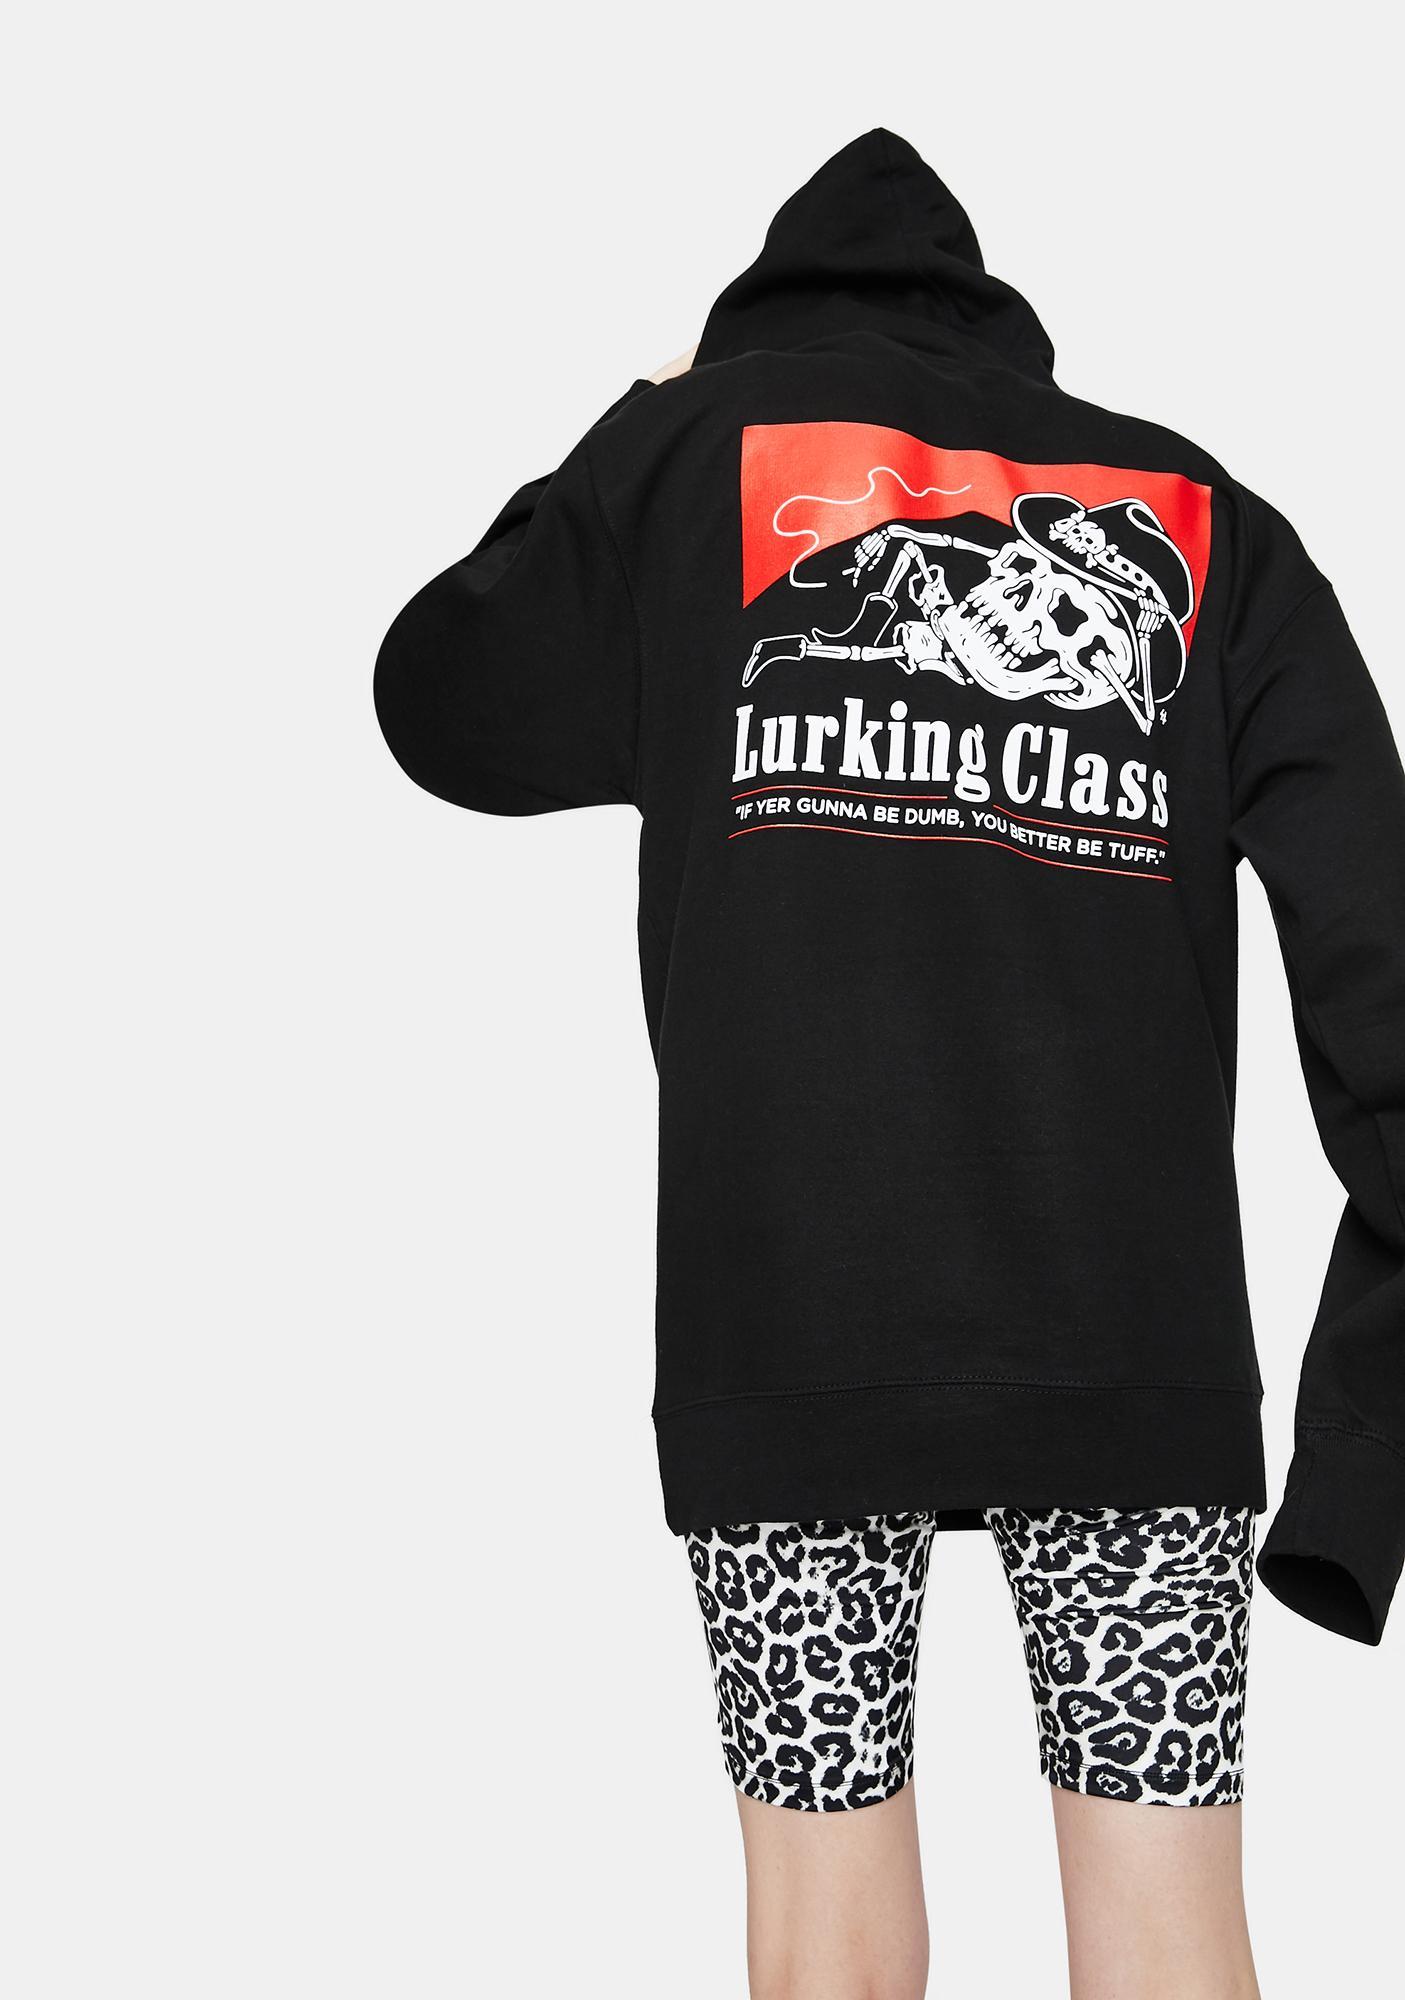 Lurking Class Dumb Graphic Hoodie